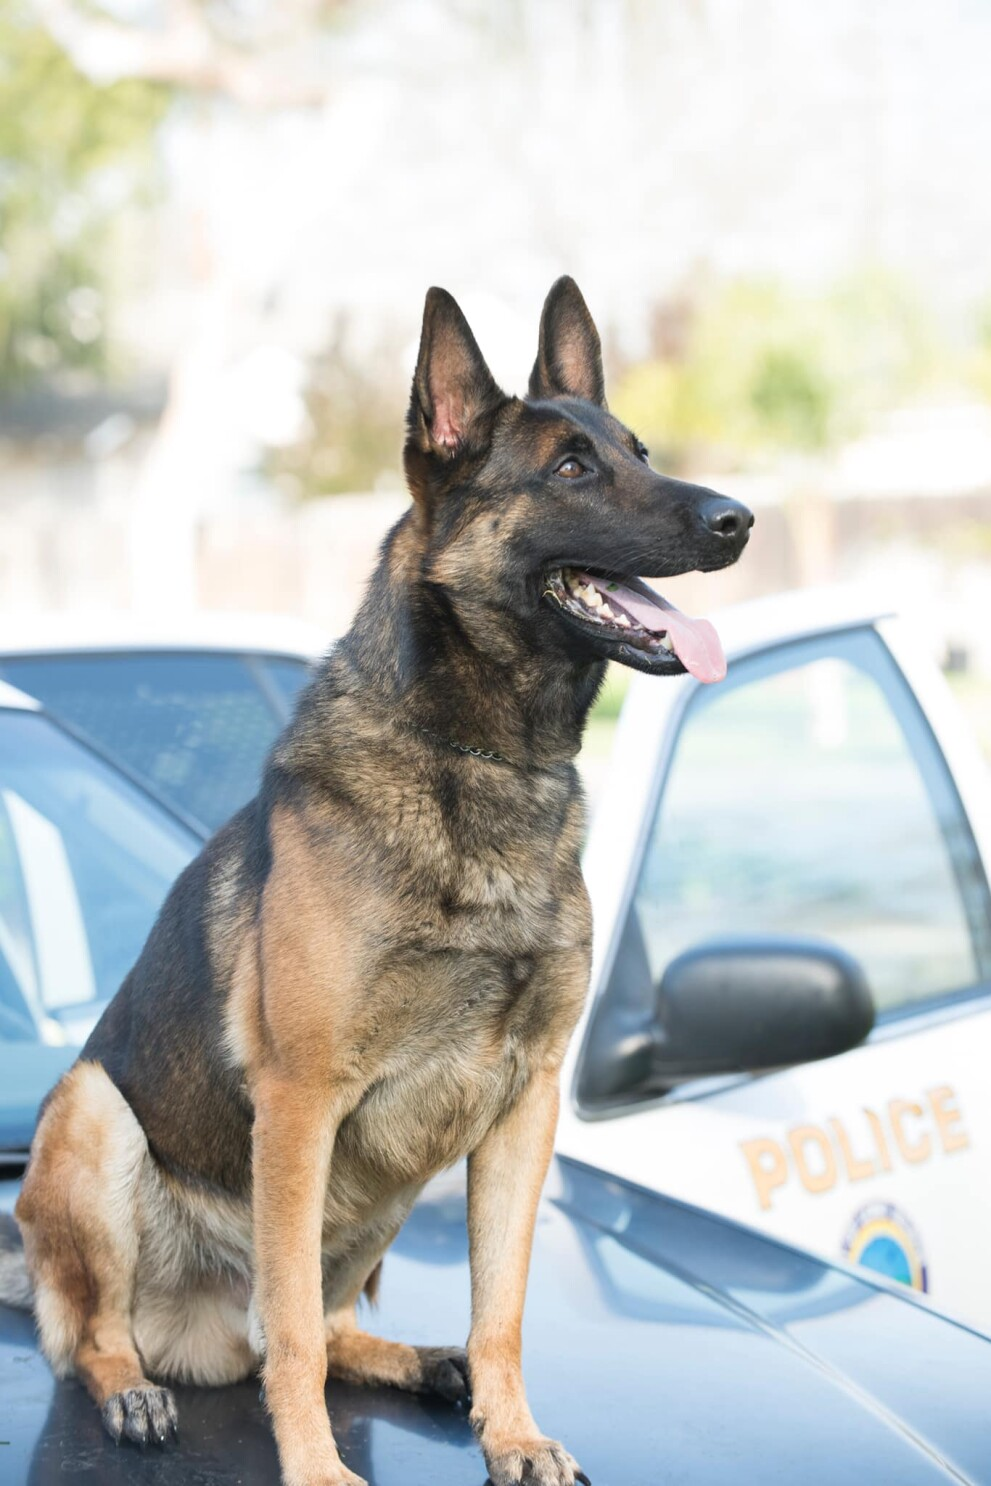 K-9 found dead in Long Beach officer's hot patrol car